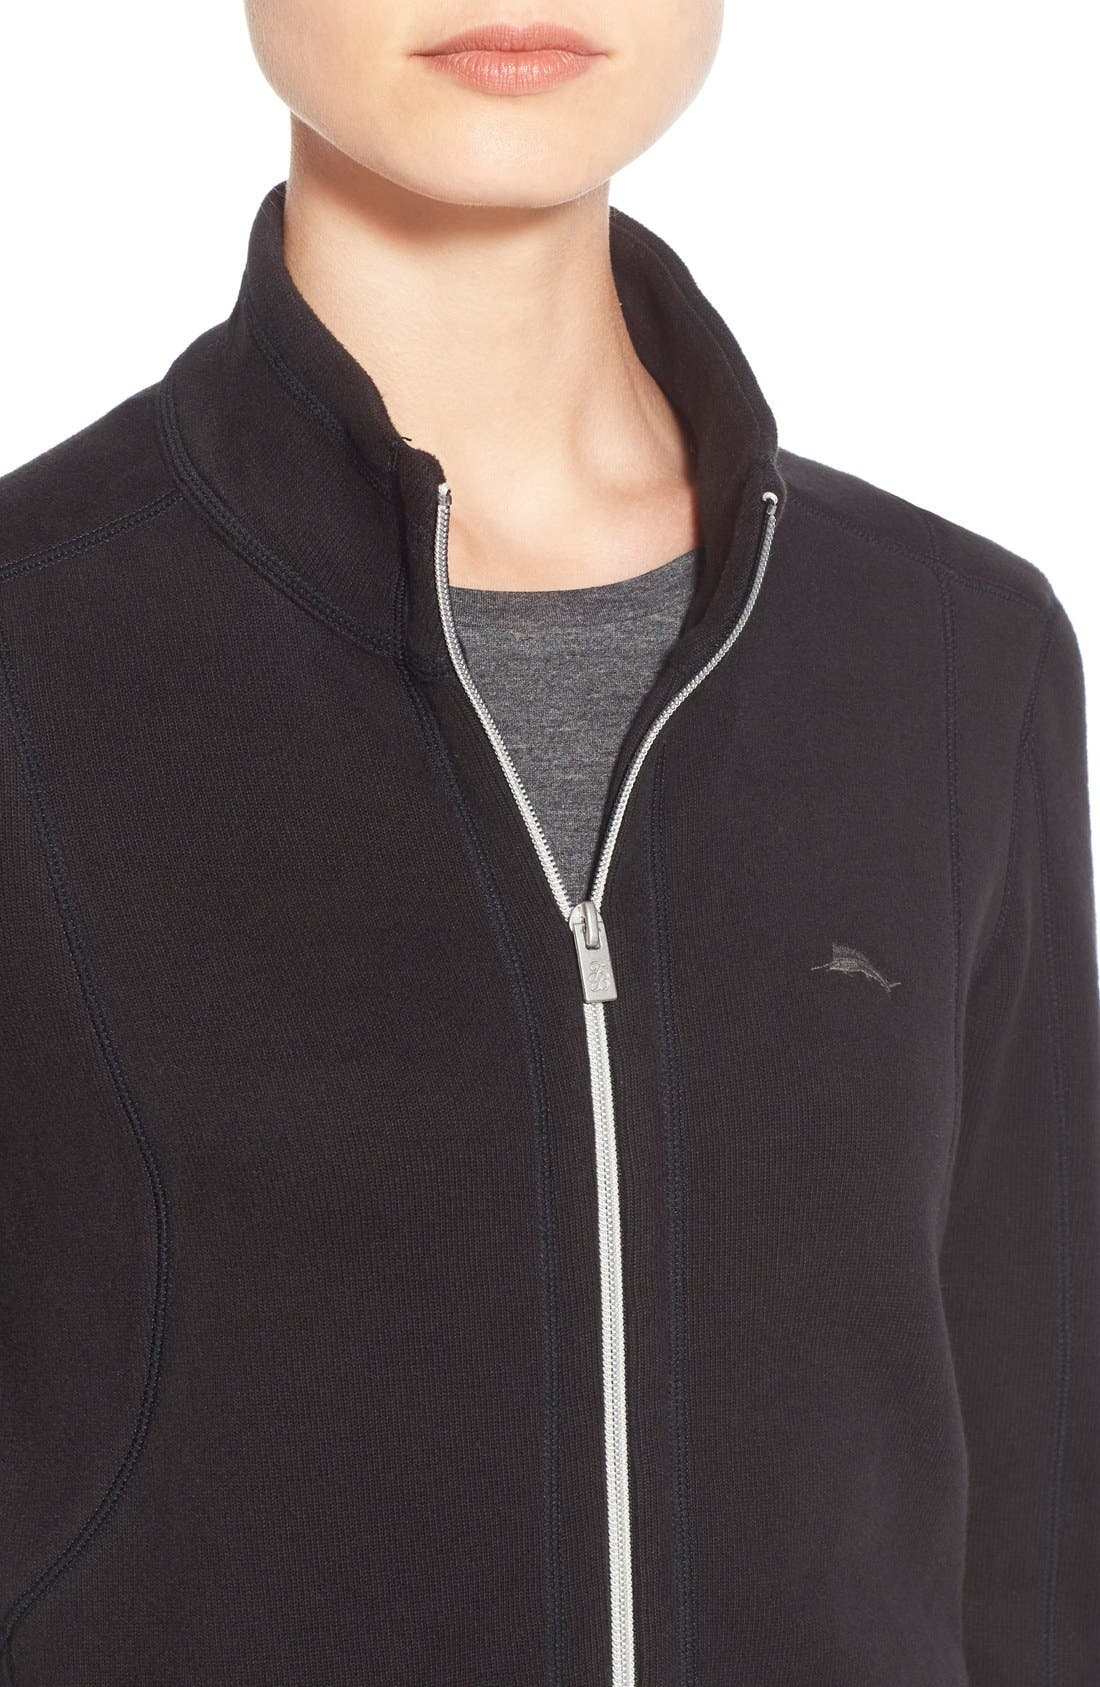 'Aruba' Full Zip Sweatshirt,                             Alternate thumbnail 33, color,